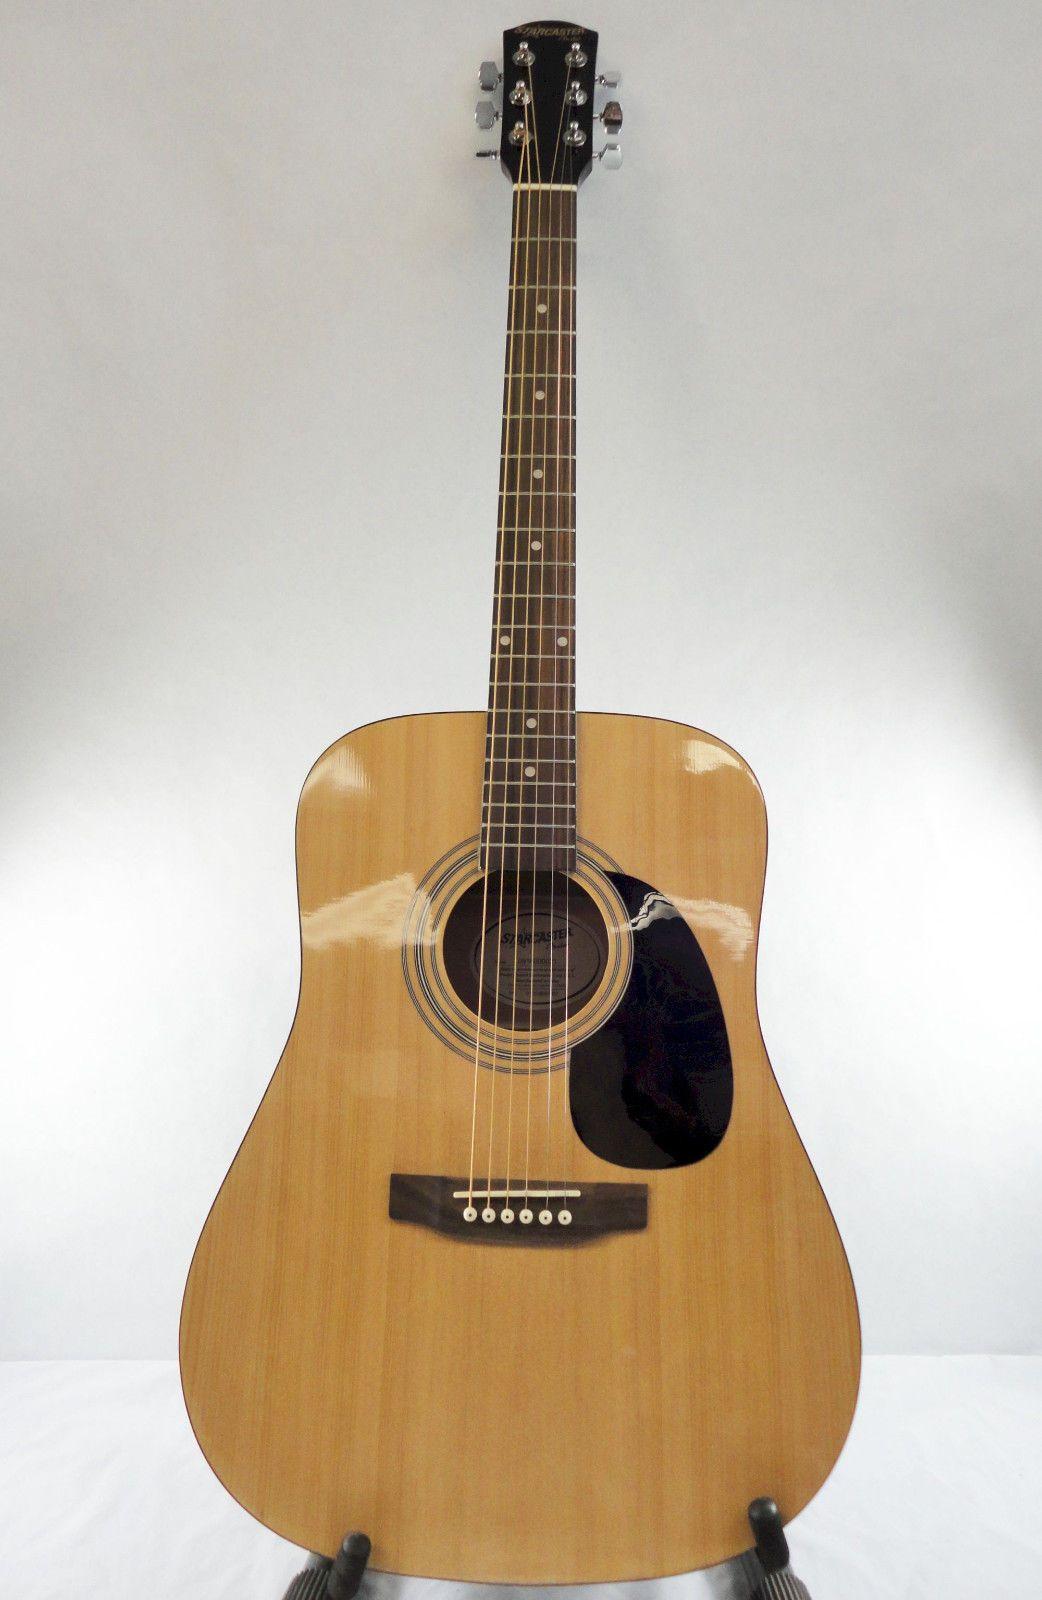 Fender Starcaster Acoustic Guitar 0916000021 No Reserve Price